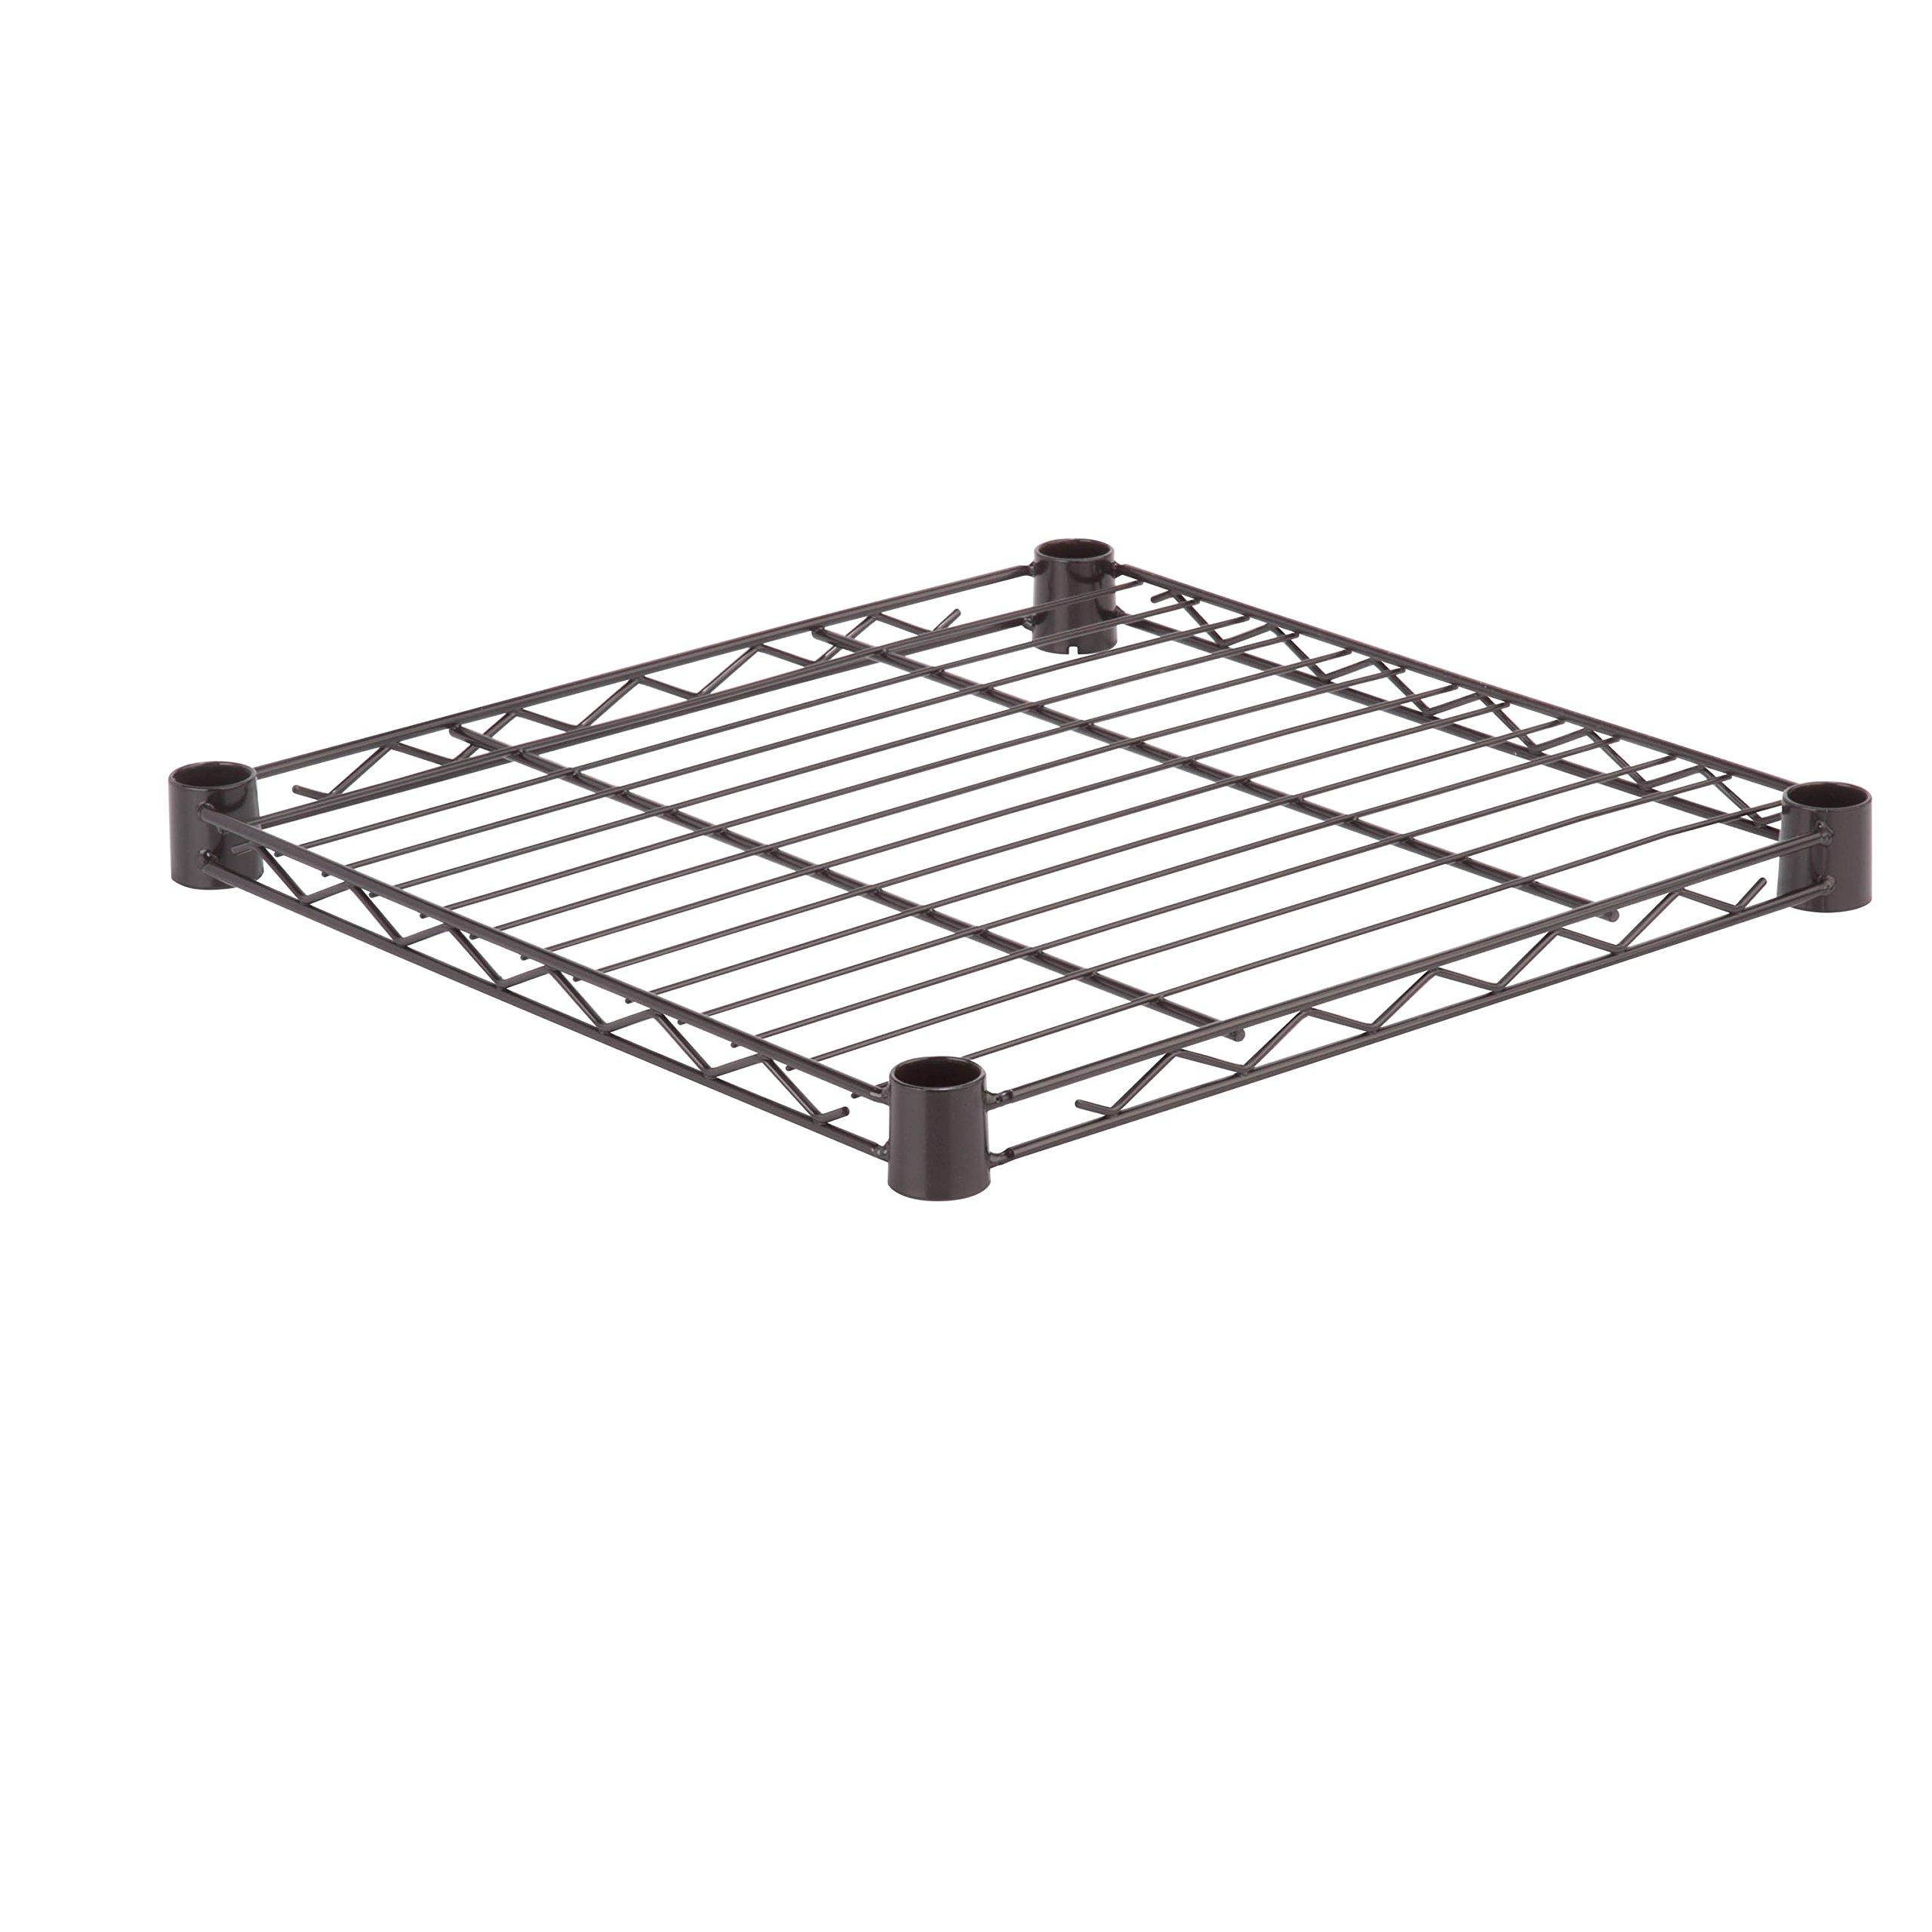 Honey-Can-Do SHF350B1818 Steel Wire Shelf for Urban Shelving Units, 350lbs Capacity, Black, 18Lx18W